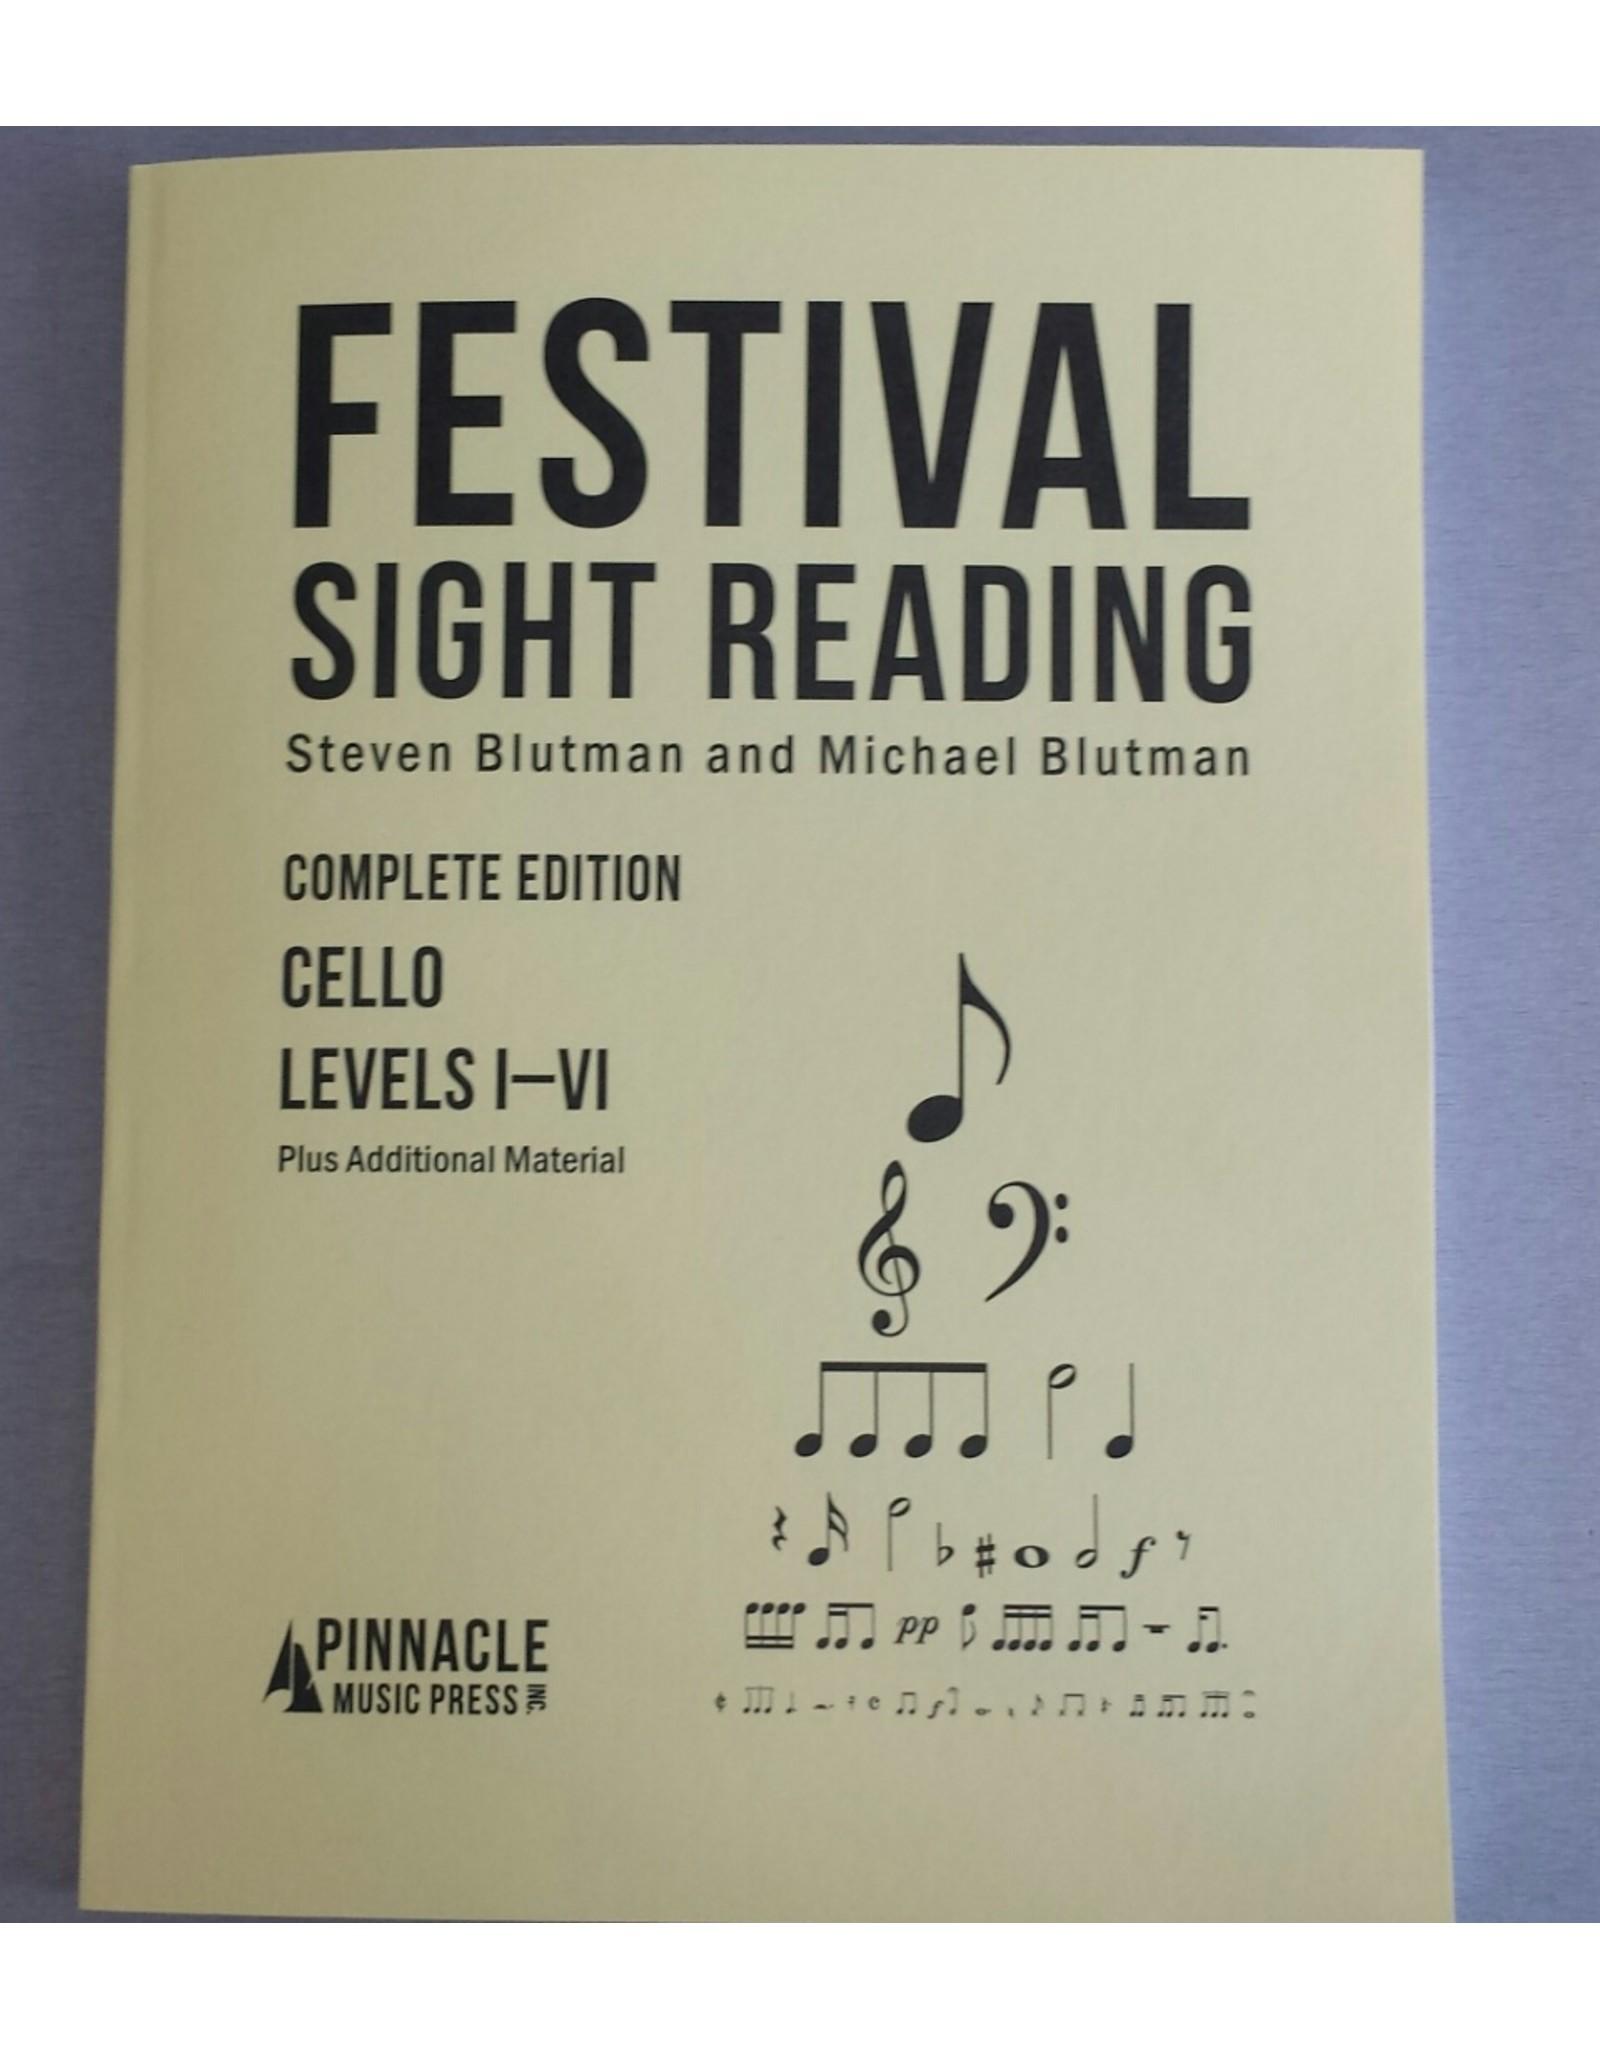 Pinnacle Music Press Festival Sight Reading